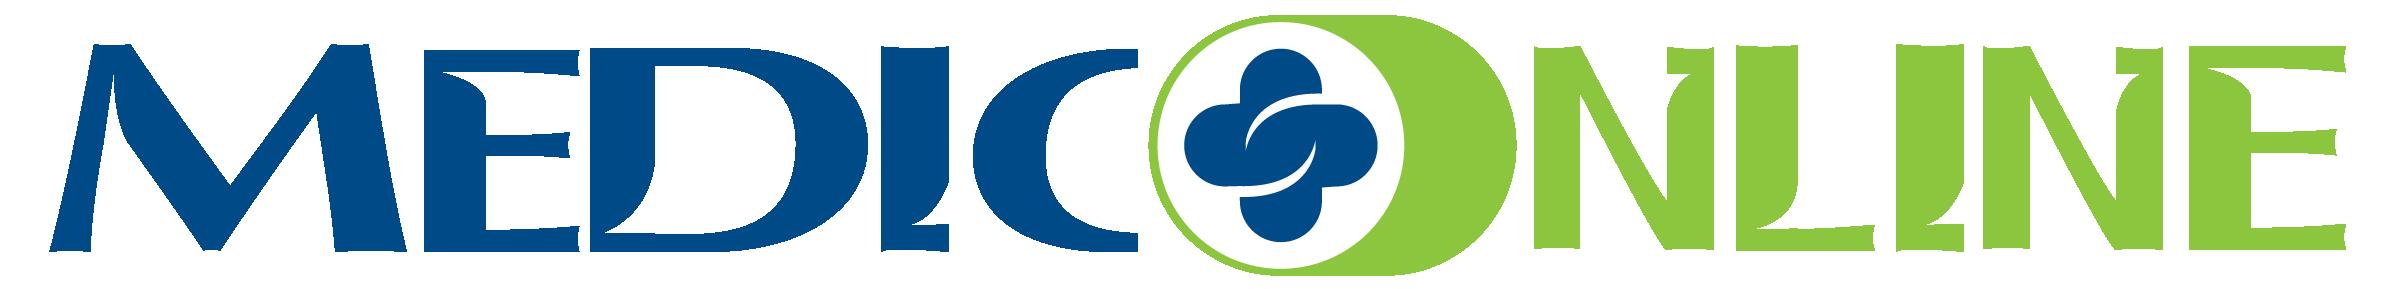 Logo Mediconline Mater dei Roma